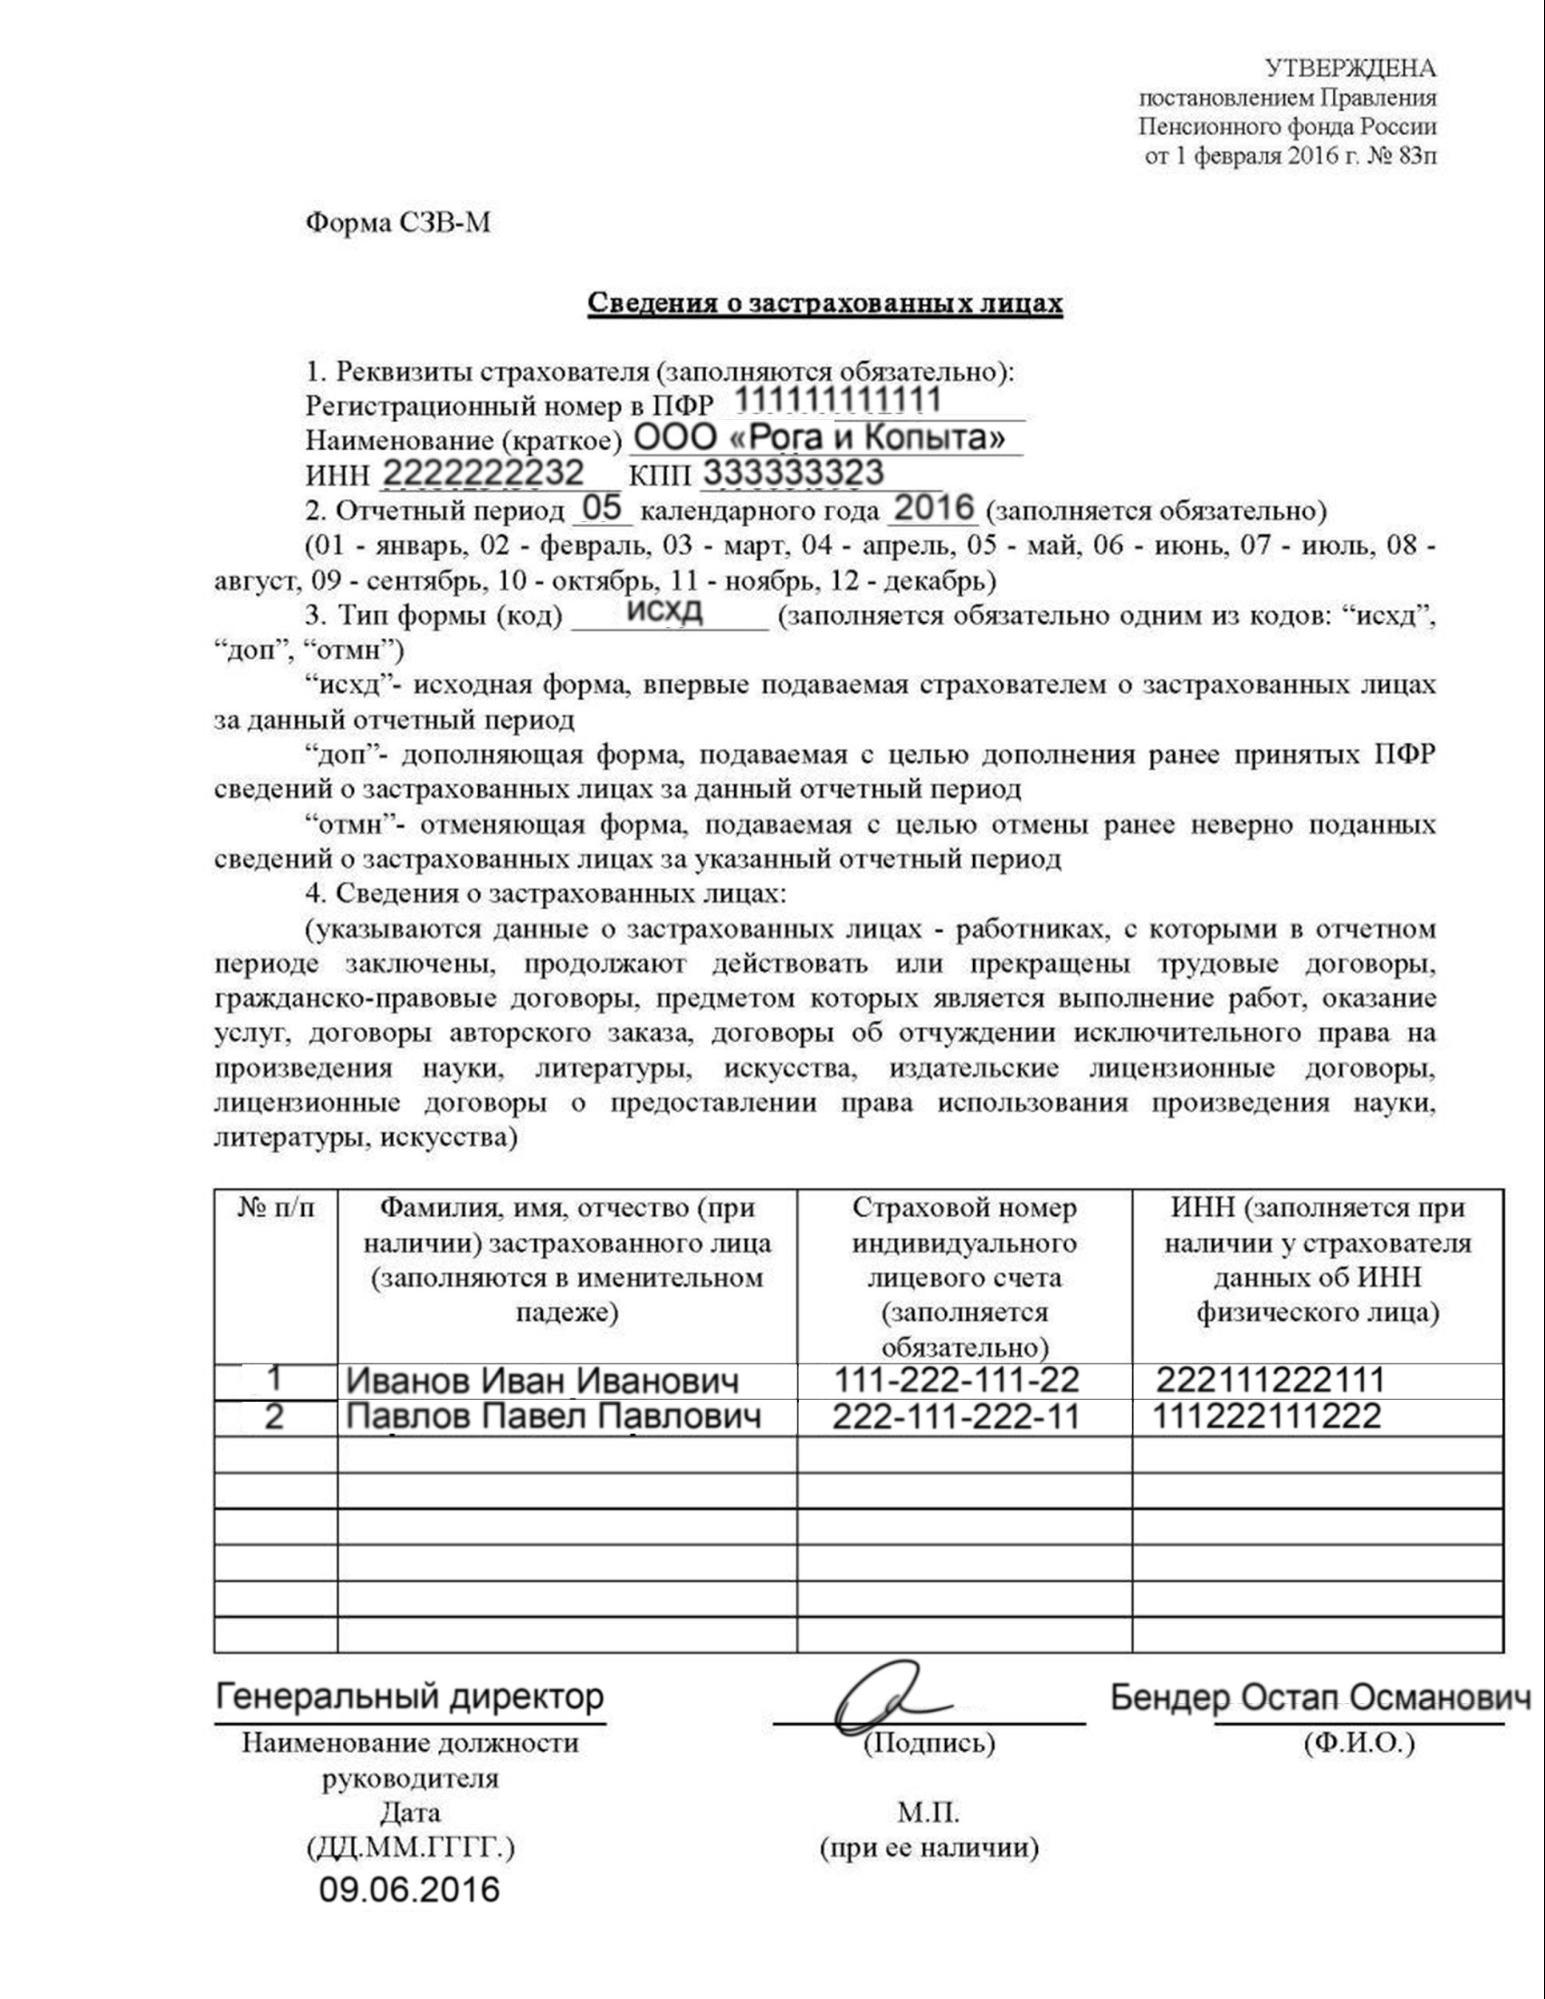 http://ppt.ru/images/news/136462-2.jpg